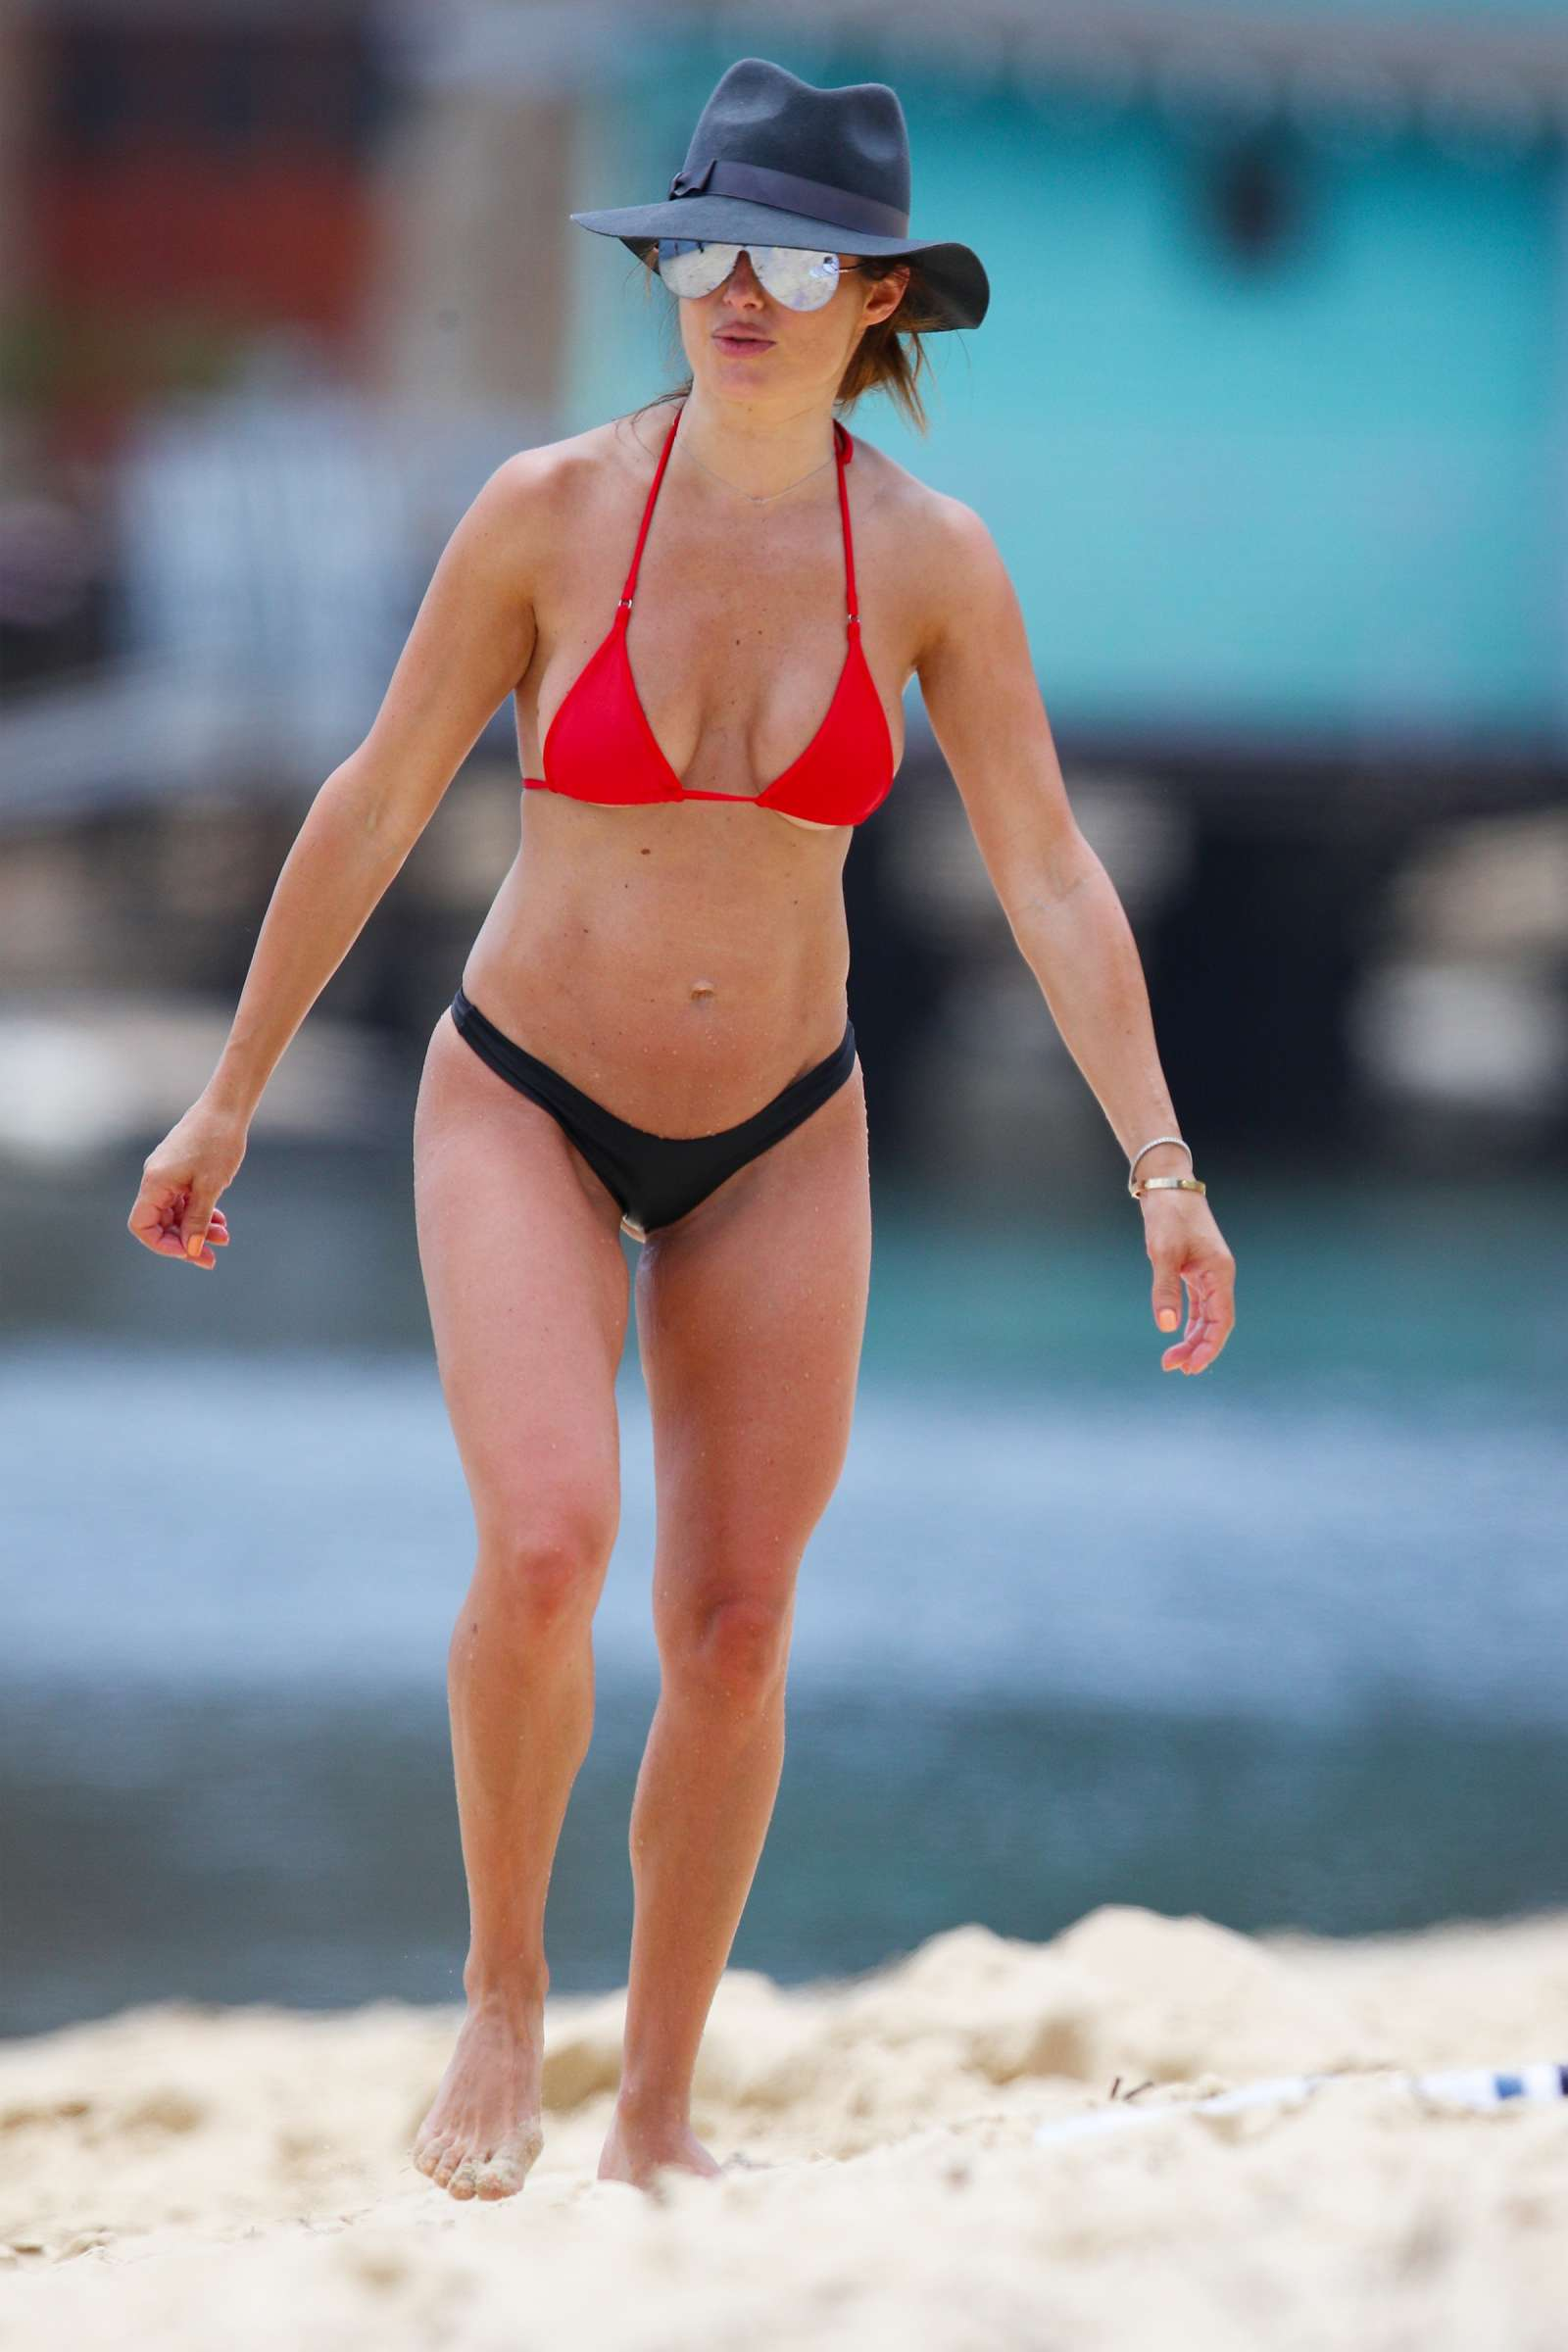 Ada Nicodemou 2019 : Ada Nicodemou in Black and Red Bikini 2019 -05